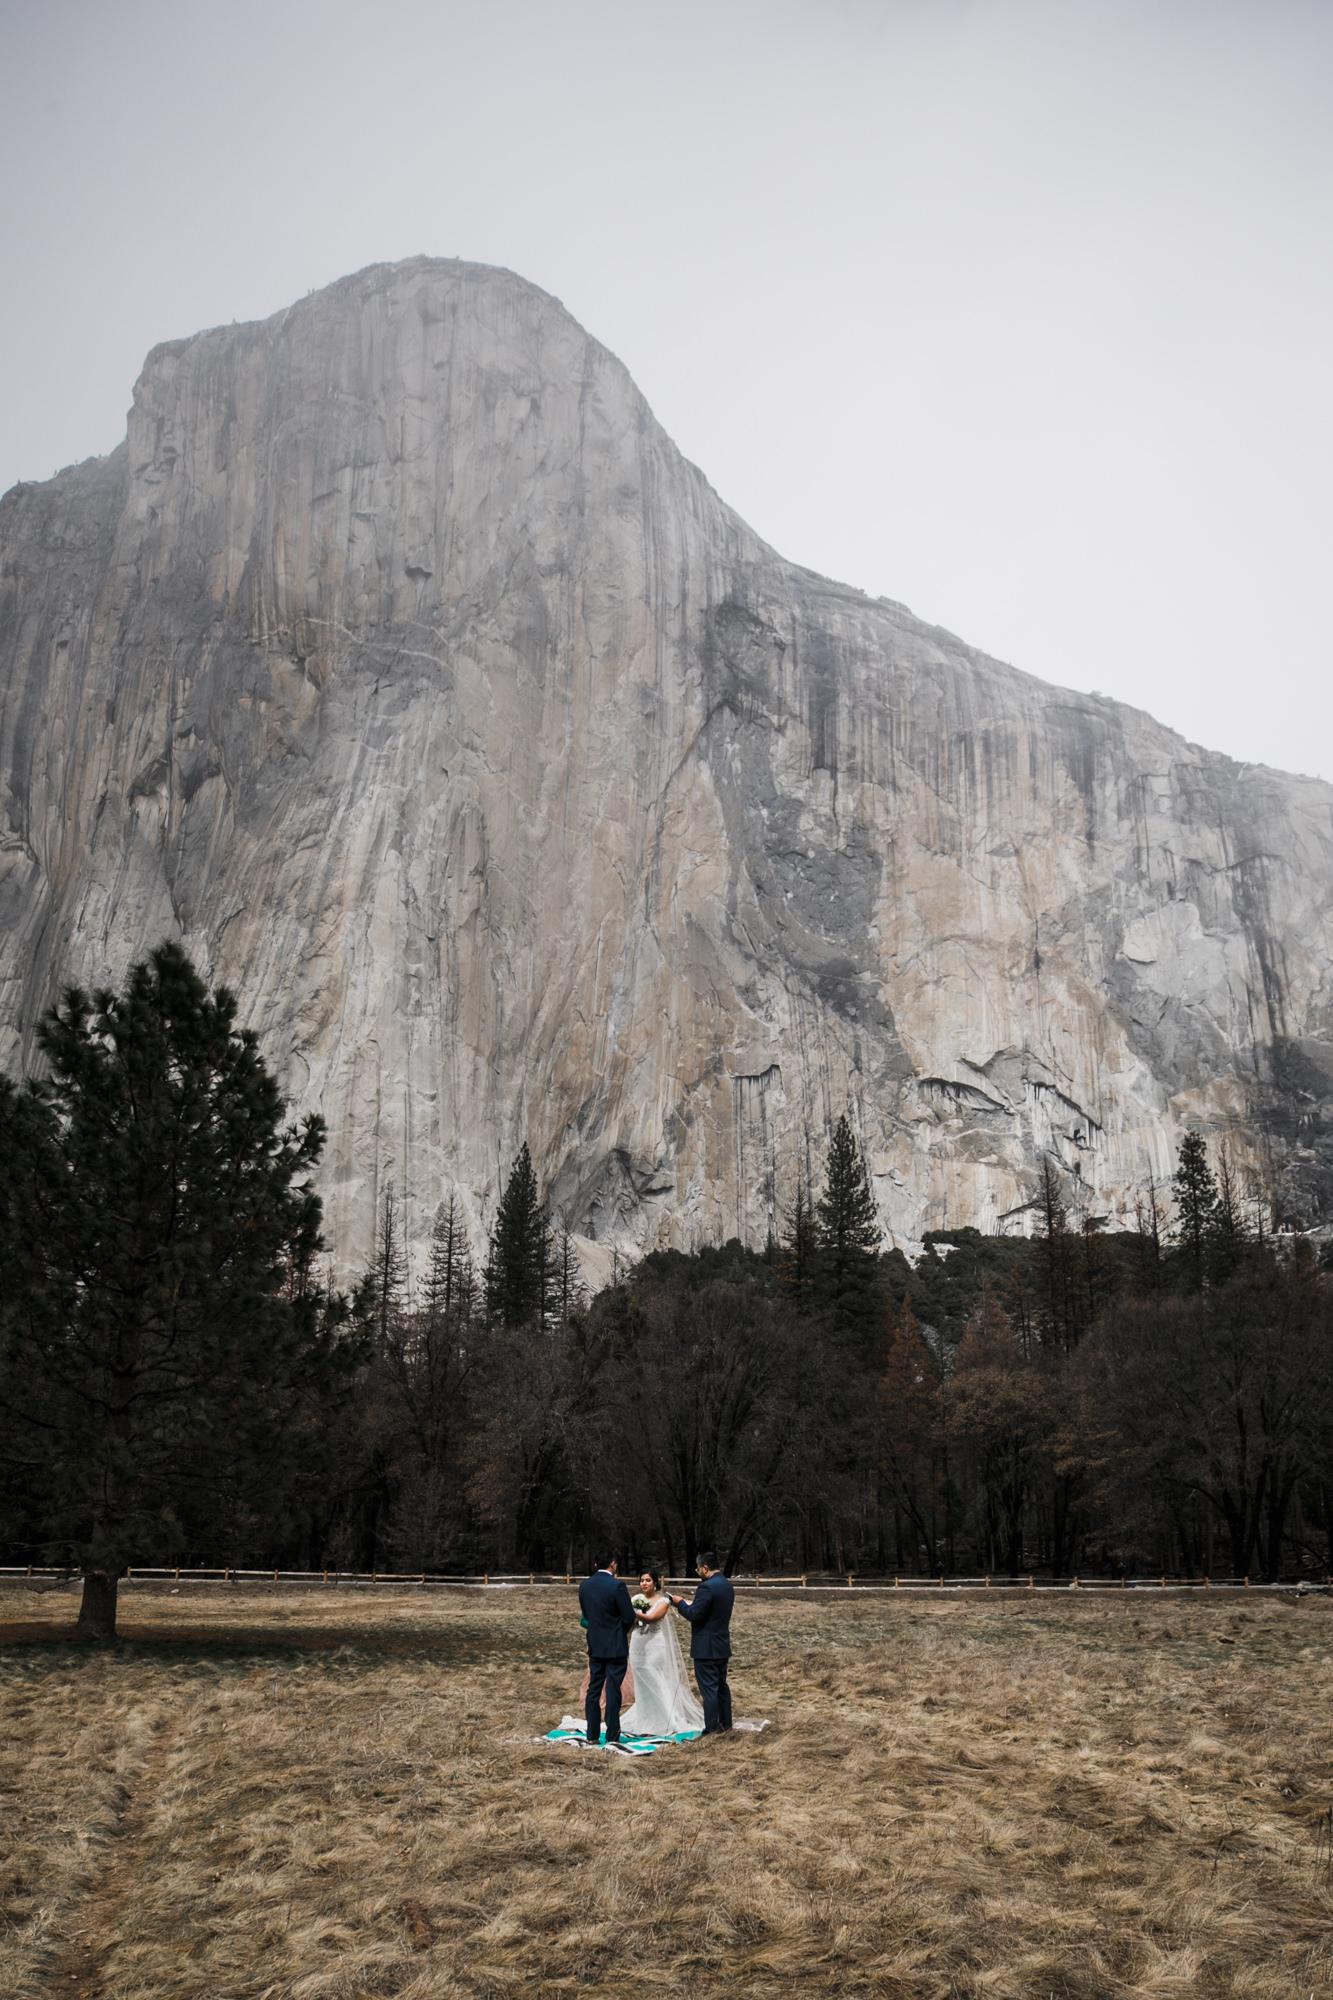 el cap meadow is one of our favorite wedding locations in yosemite